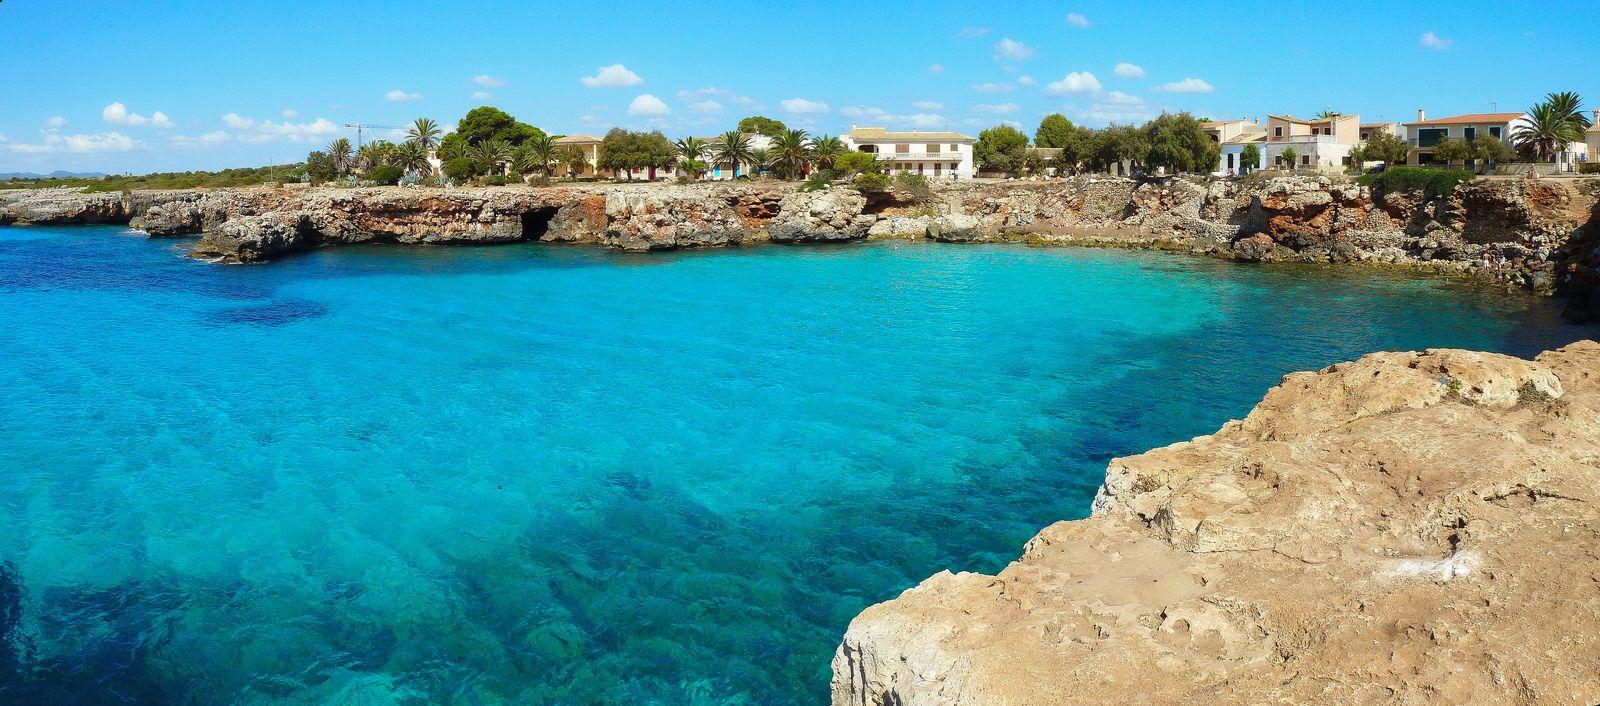 011 Cala Morlanda Mallorca